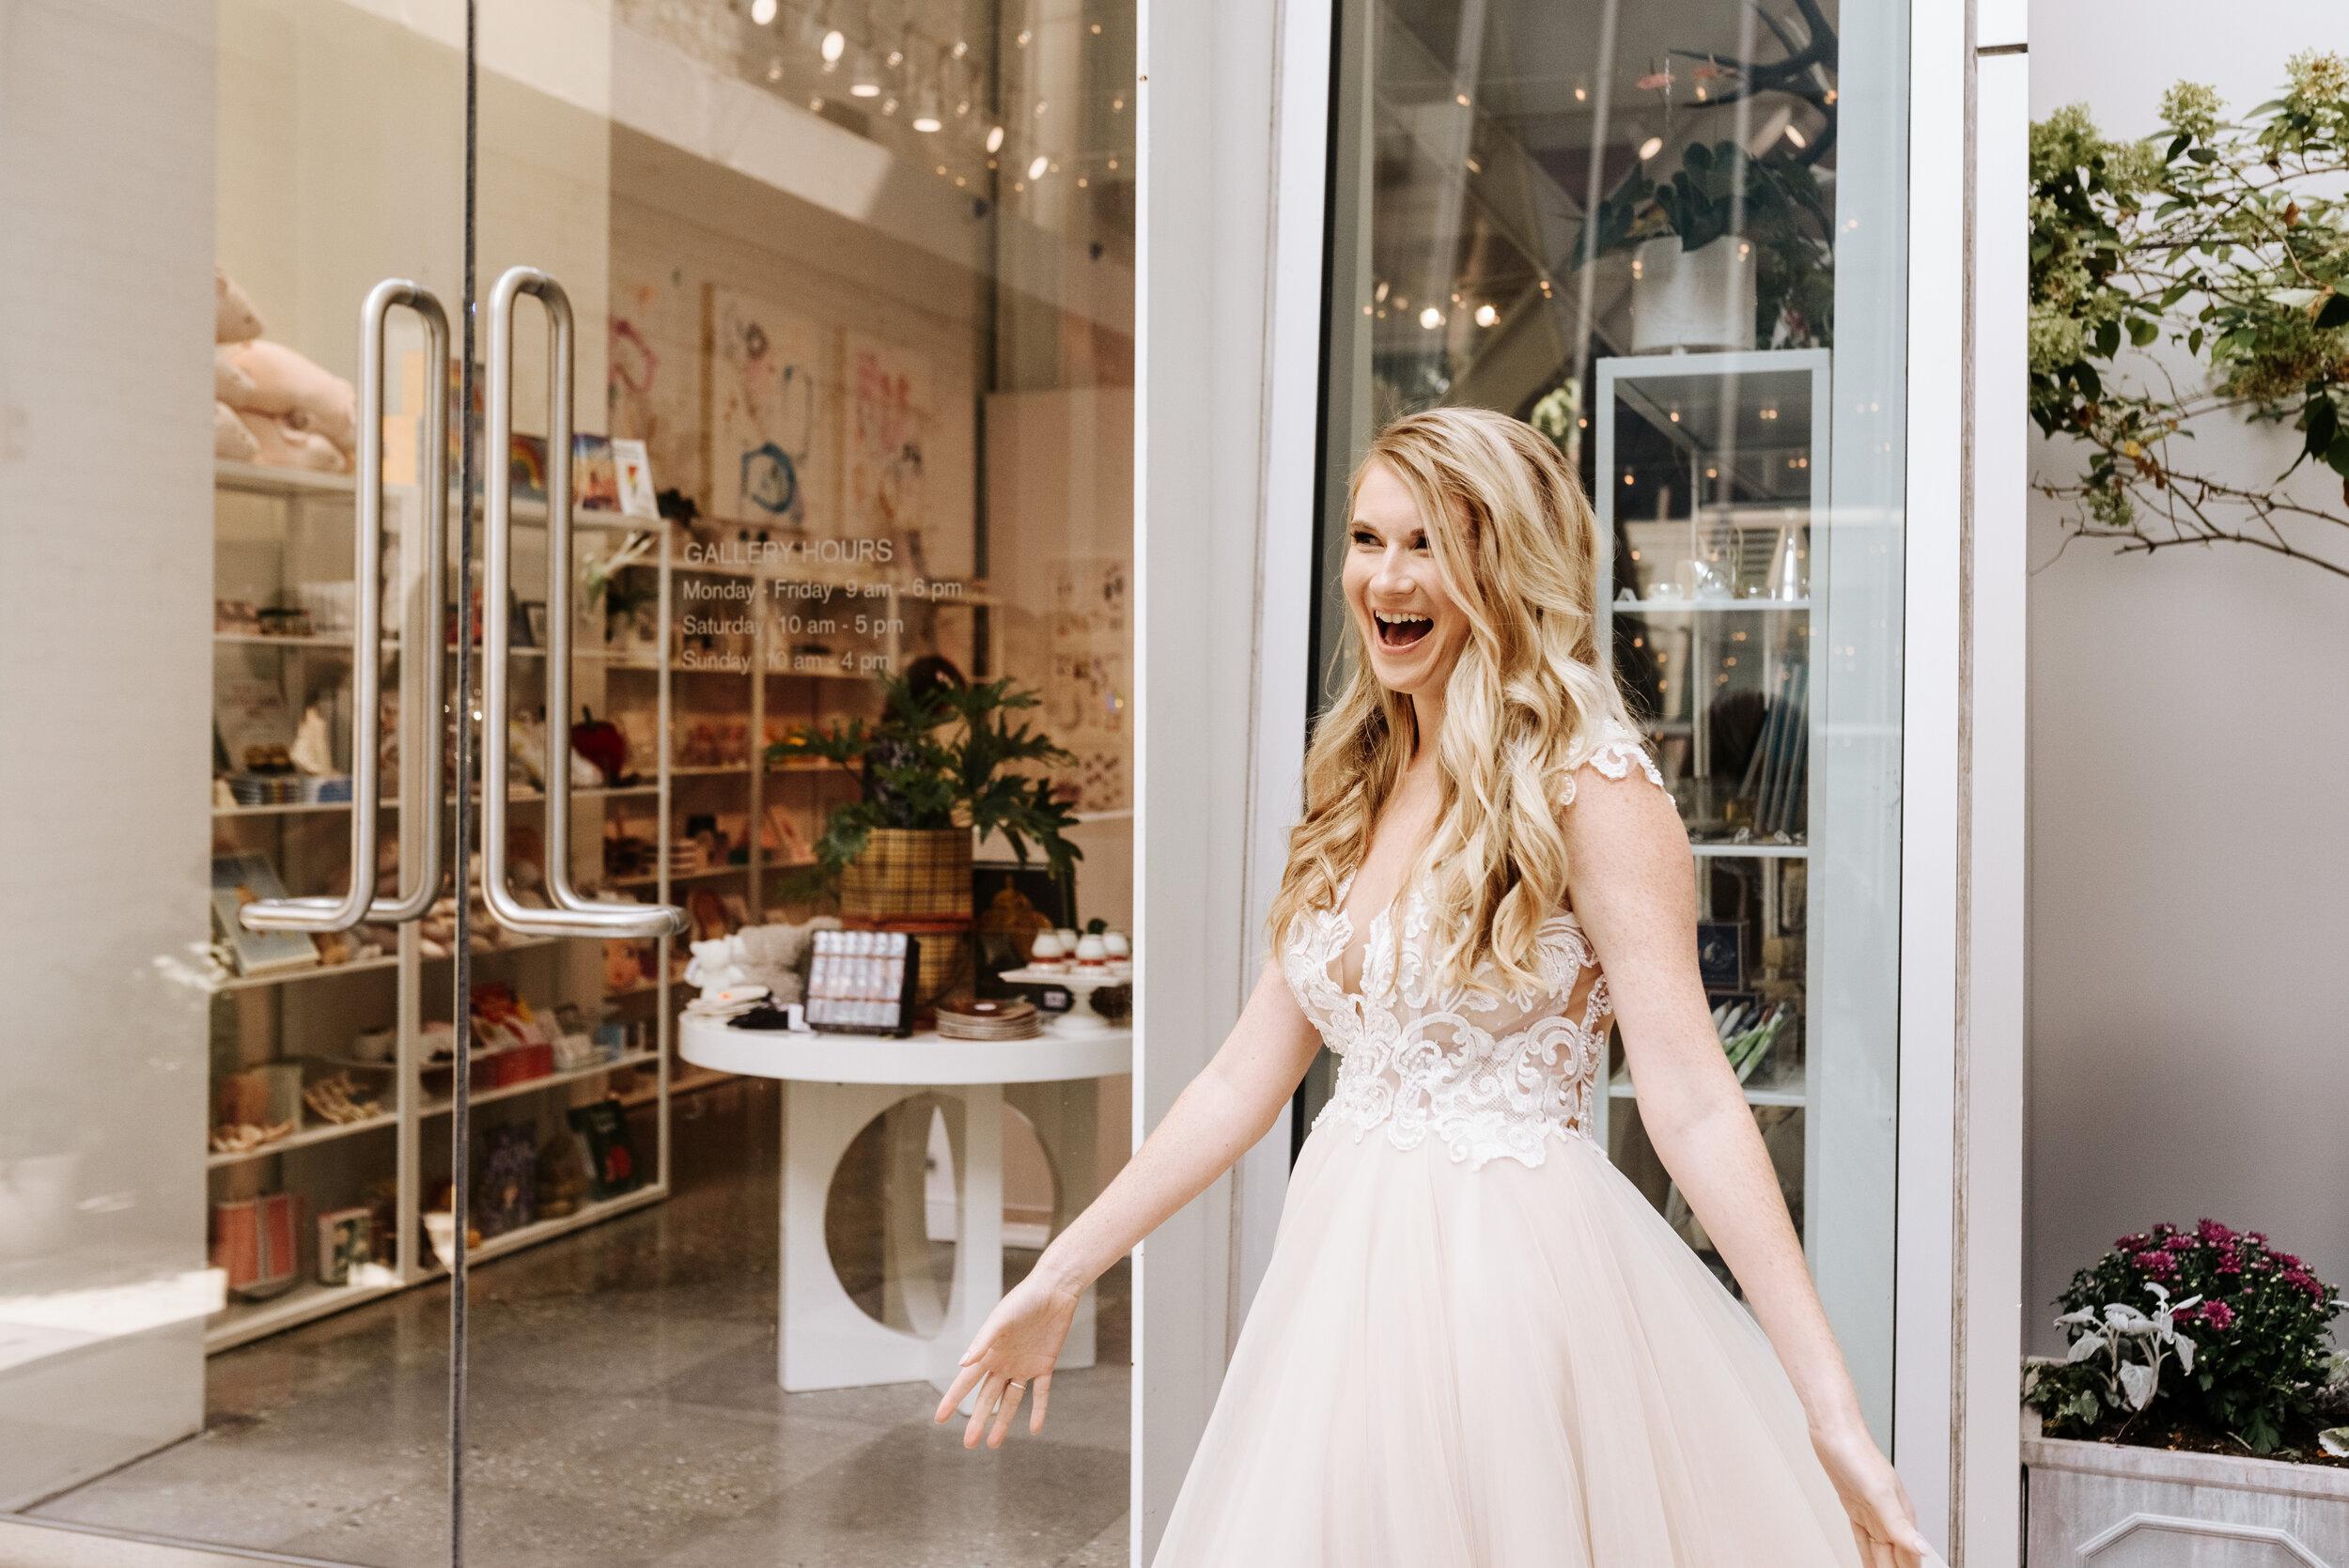 Cassie-Mrunal-Wedding-Quirk-Hotel-John-Marshall-Ballrooms-Richmond-Virginia-Photography-by-V-16.jpg